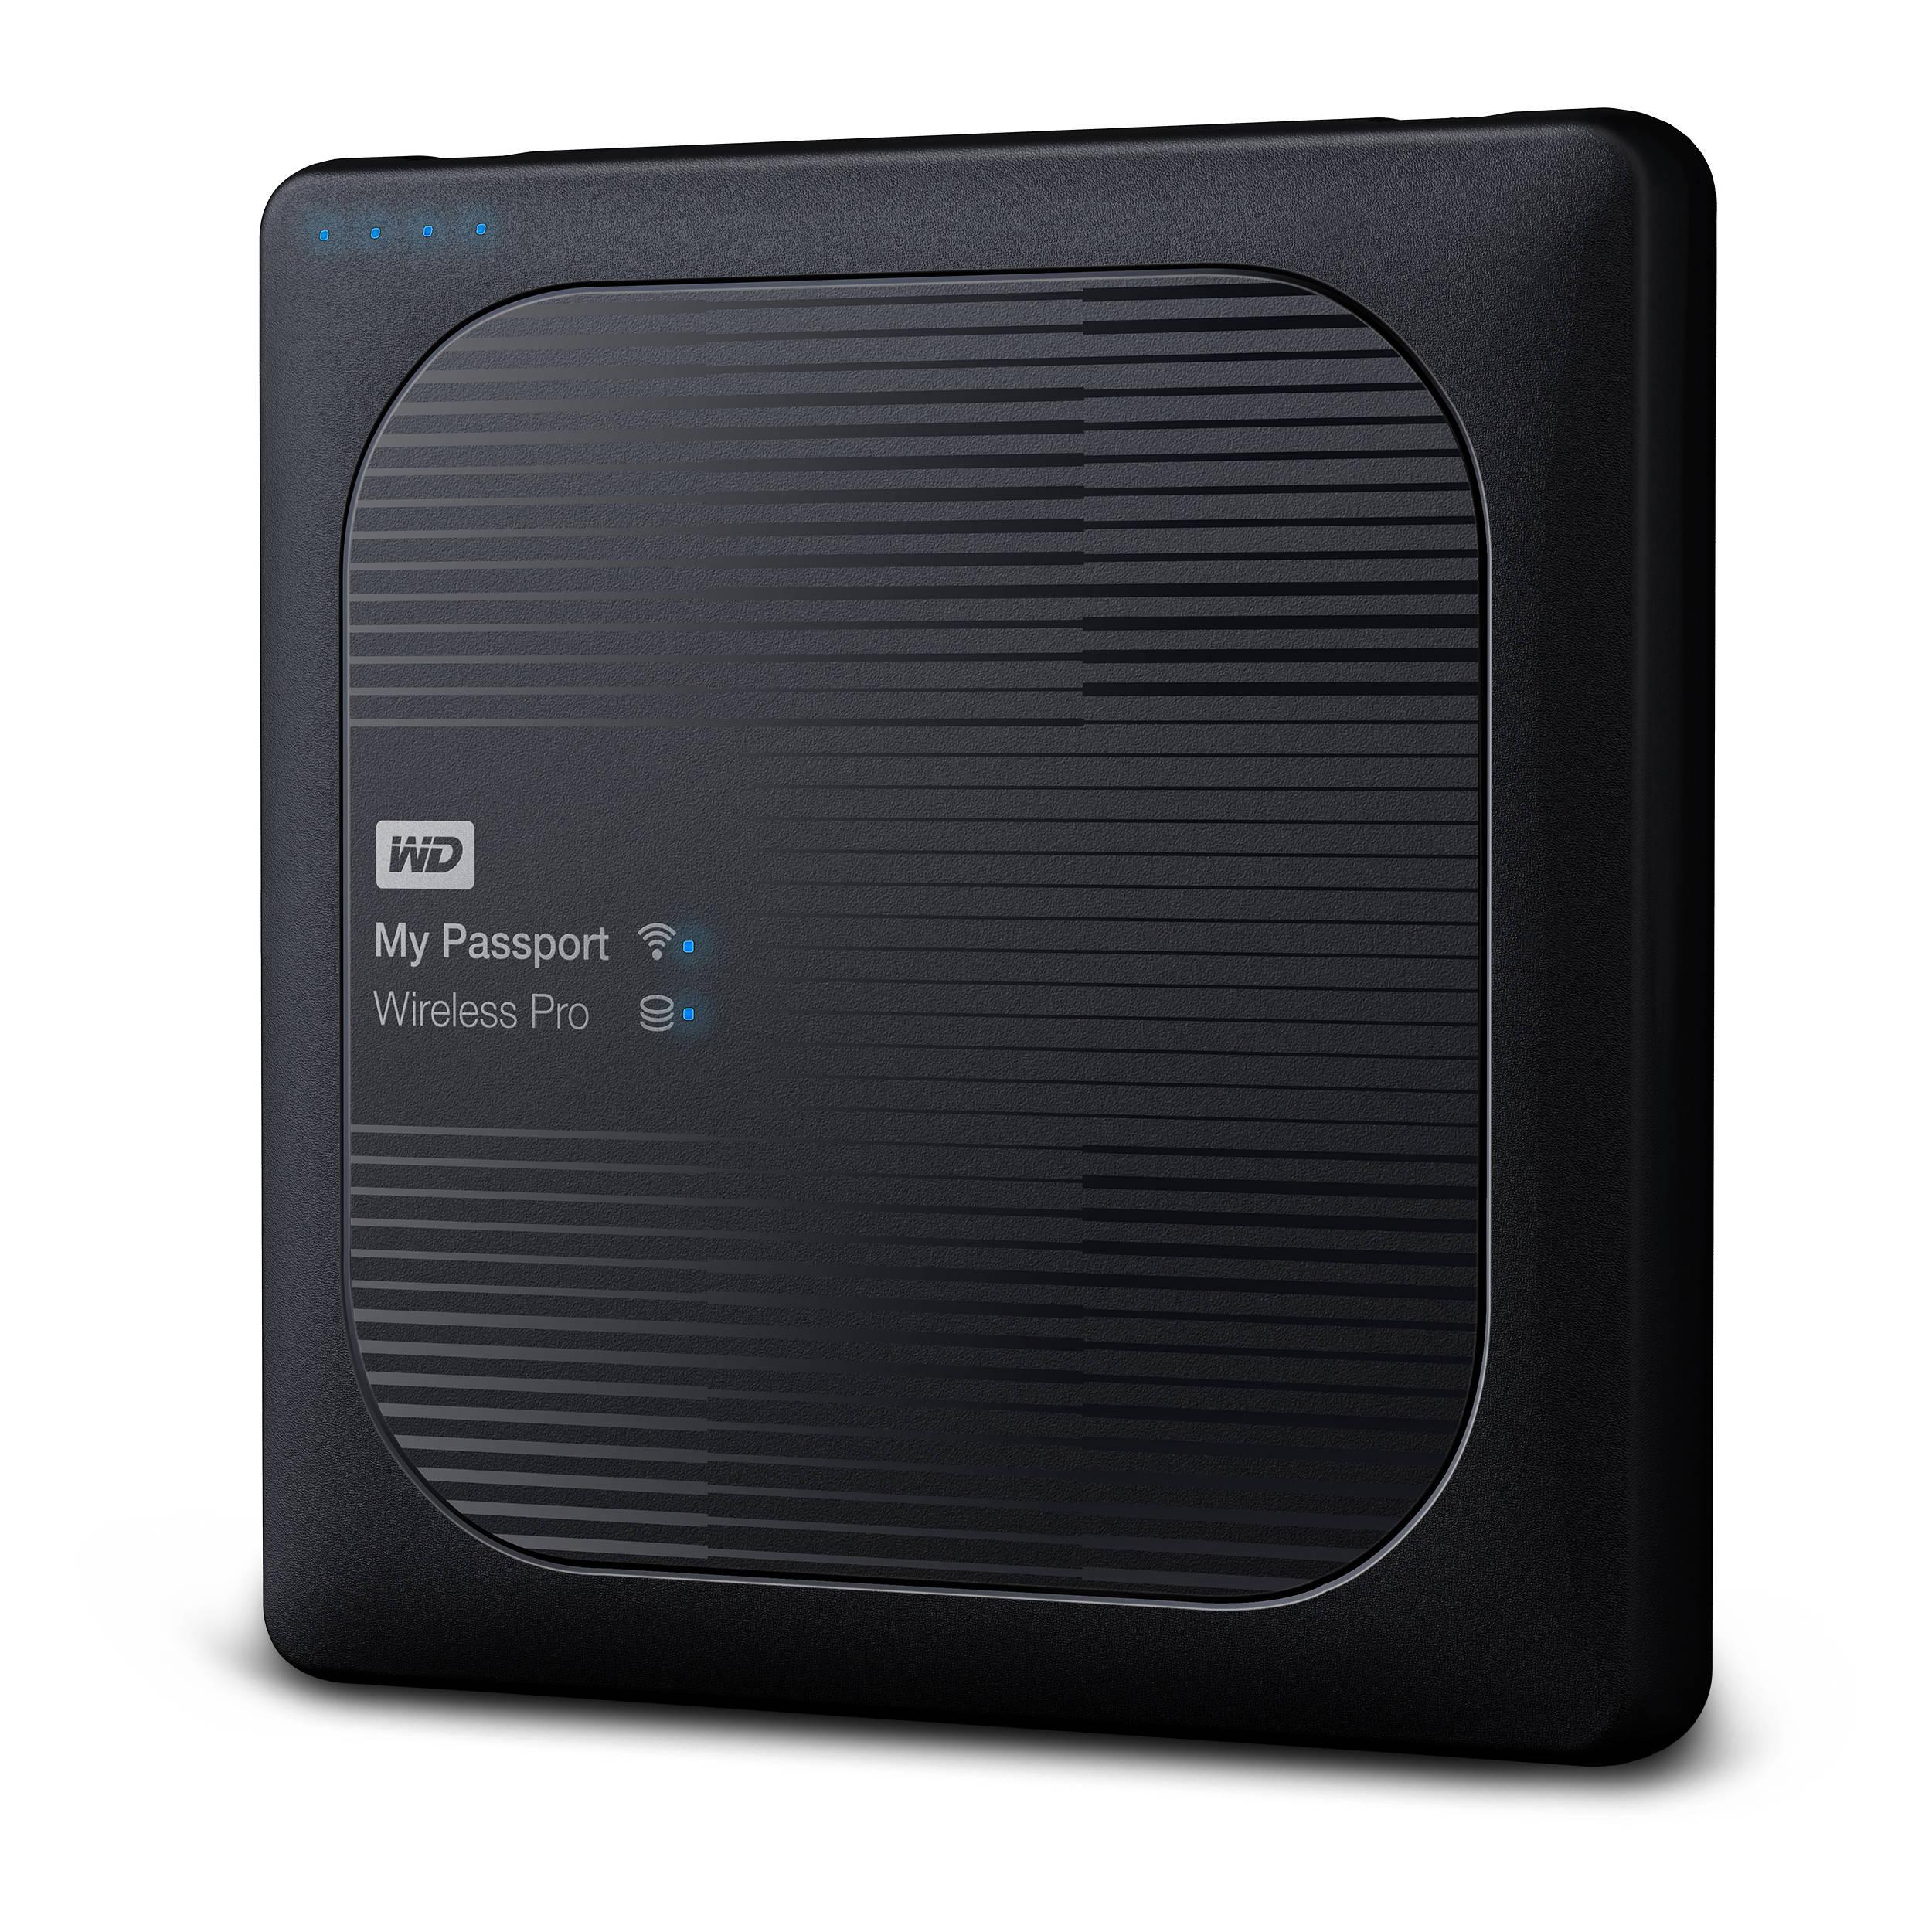 WD 1TB My Passport Wireless Pro USB 3.0 WDBVPL0010BBK-NESN B&H